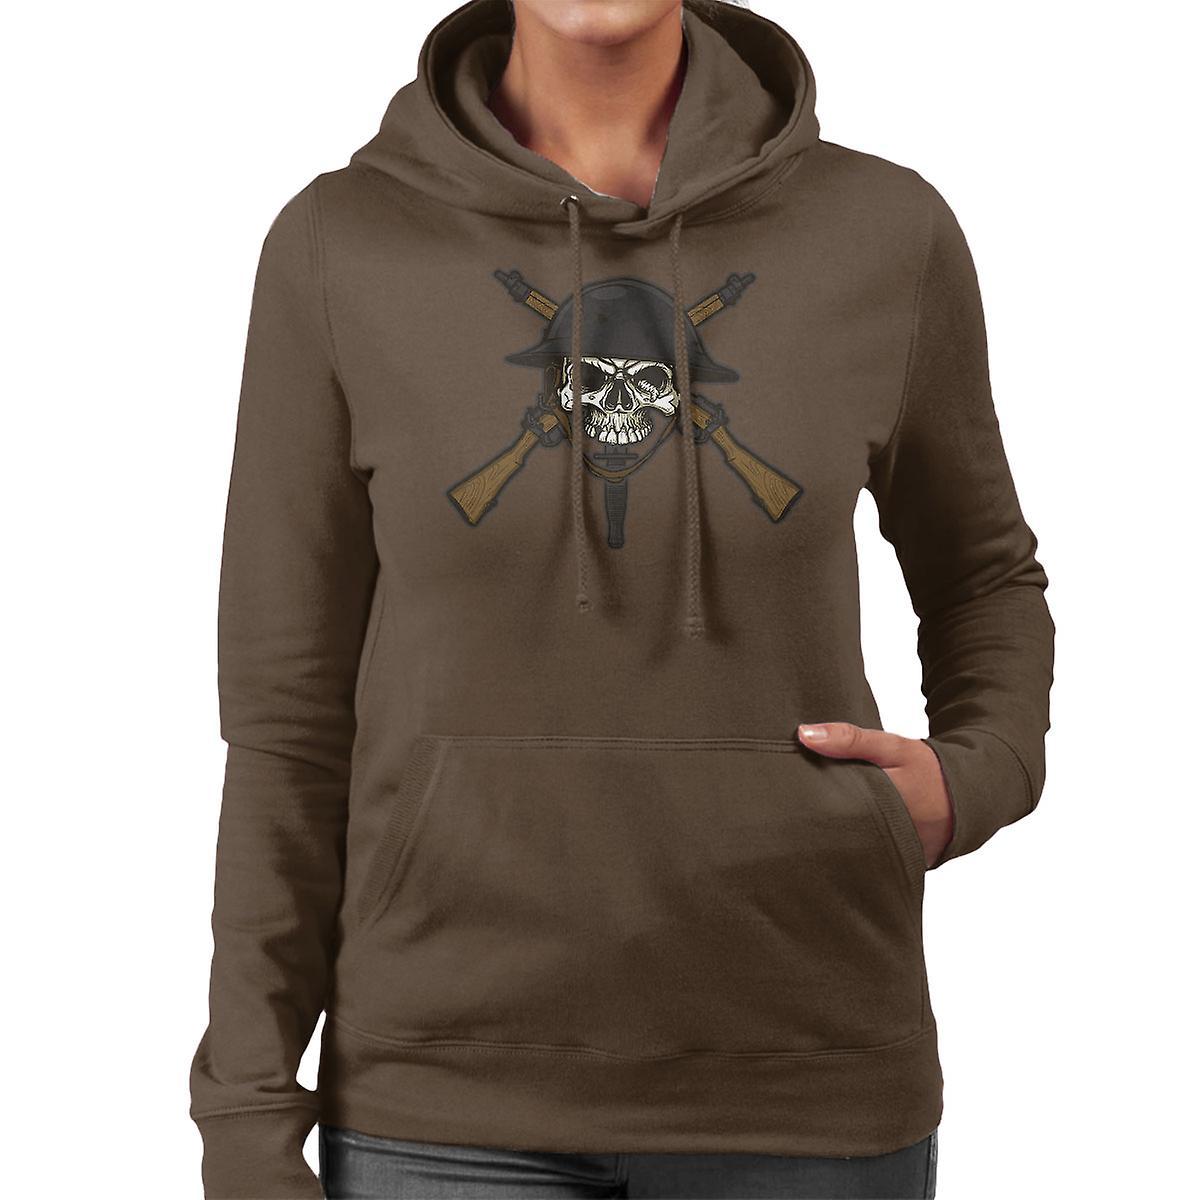 Do Your Bit On The Battlefield Women's Hooded Sweatshirt